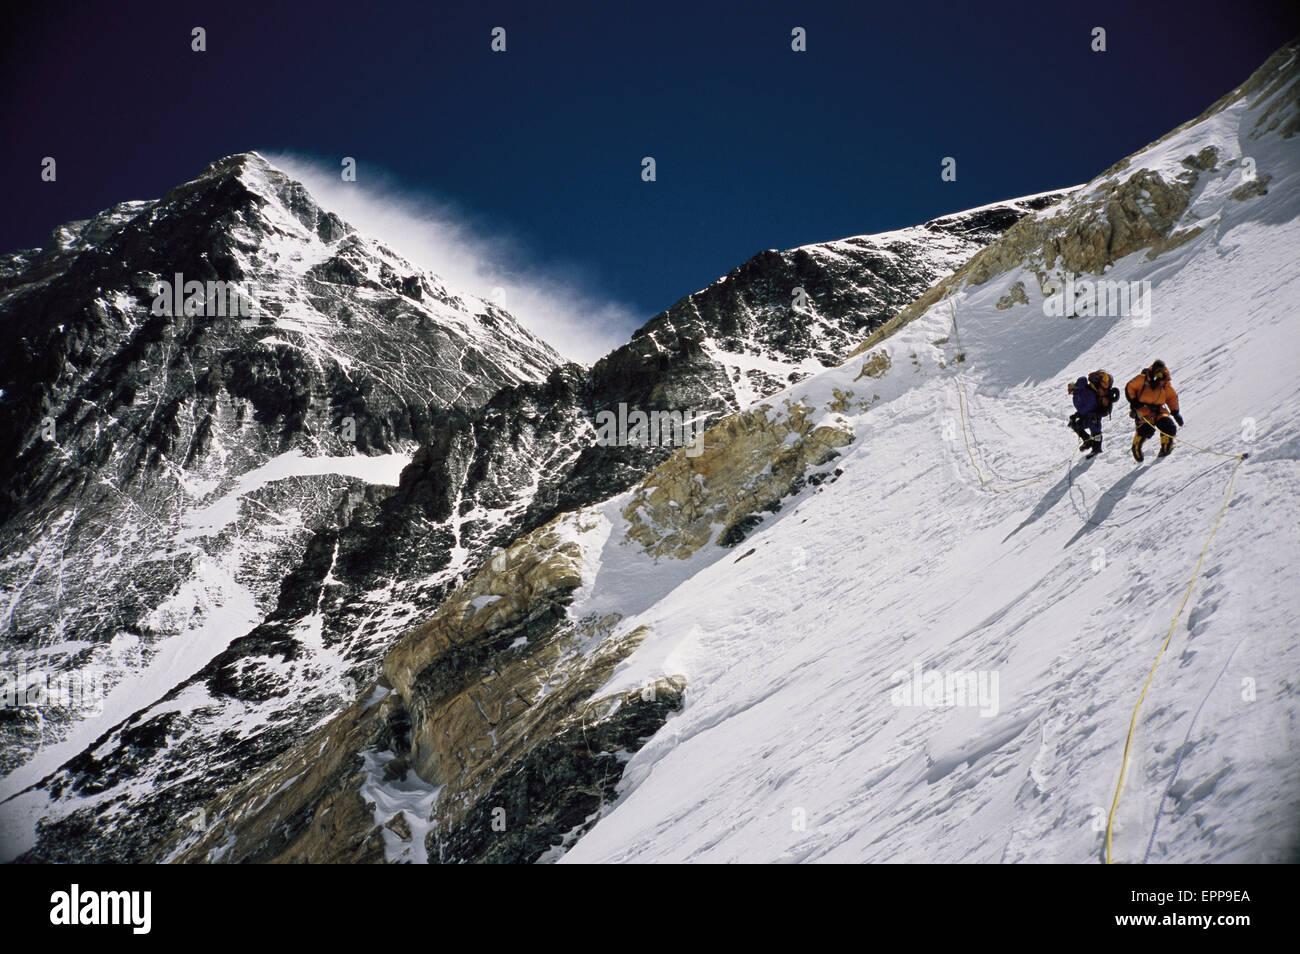 Mount Everest Summit Climbers Stock Photos & Mount Everest ...